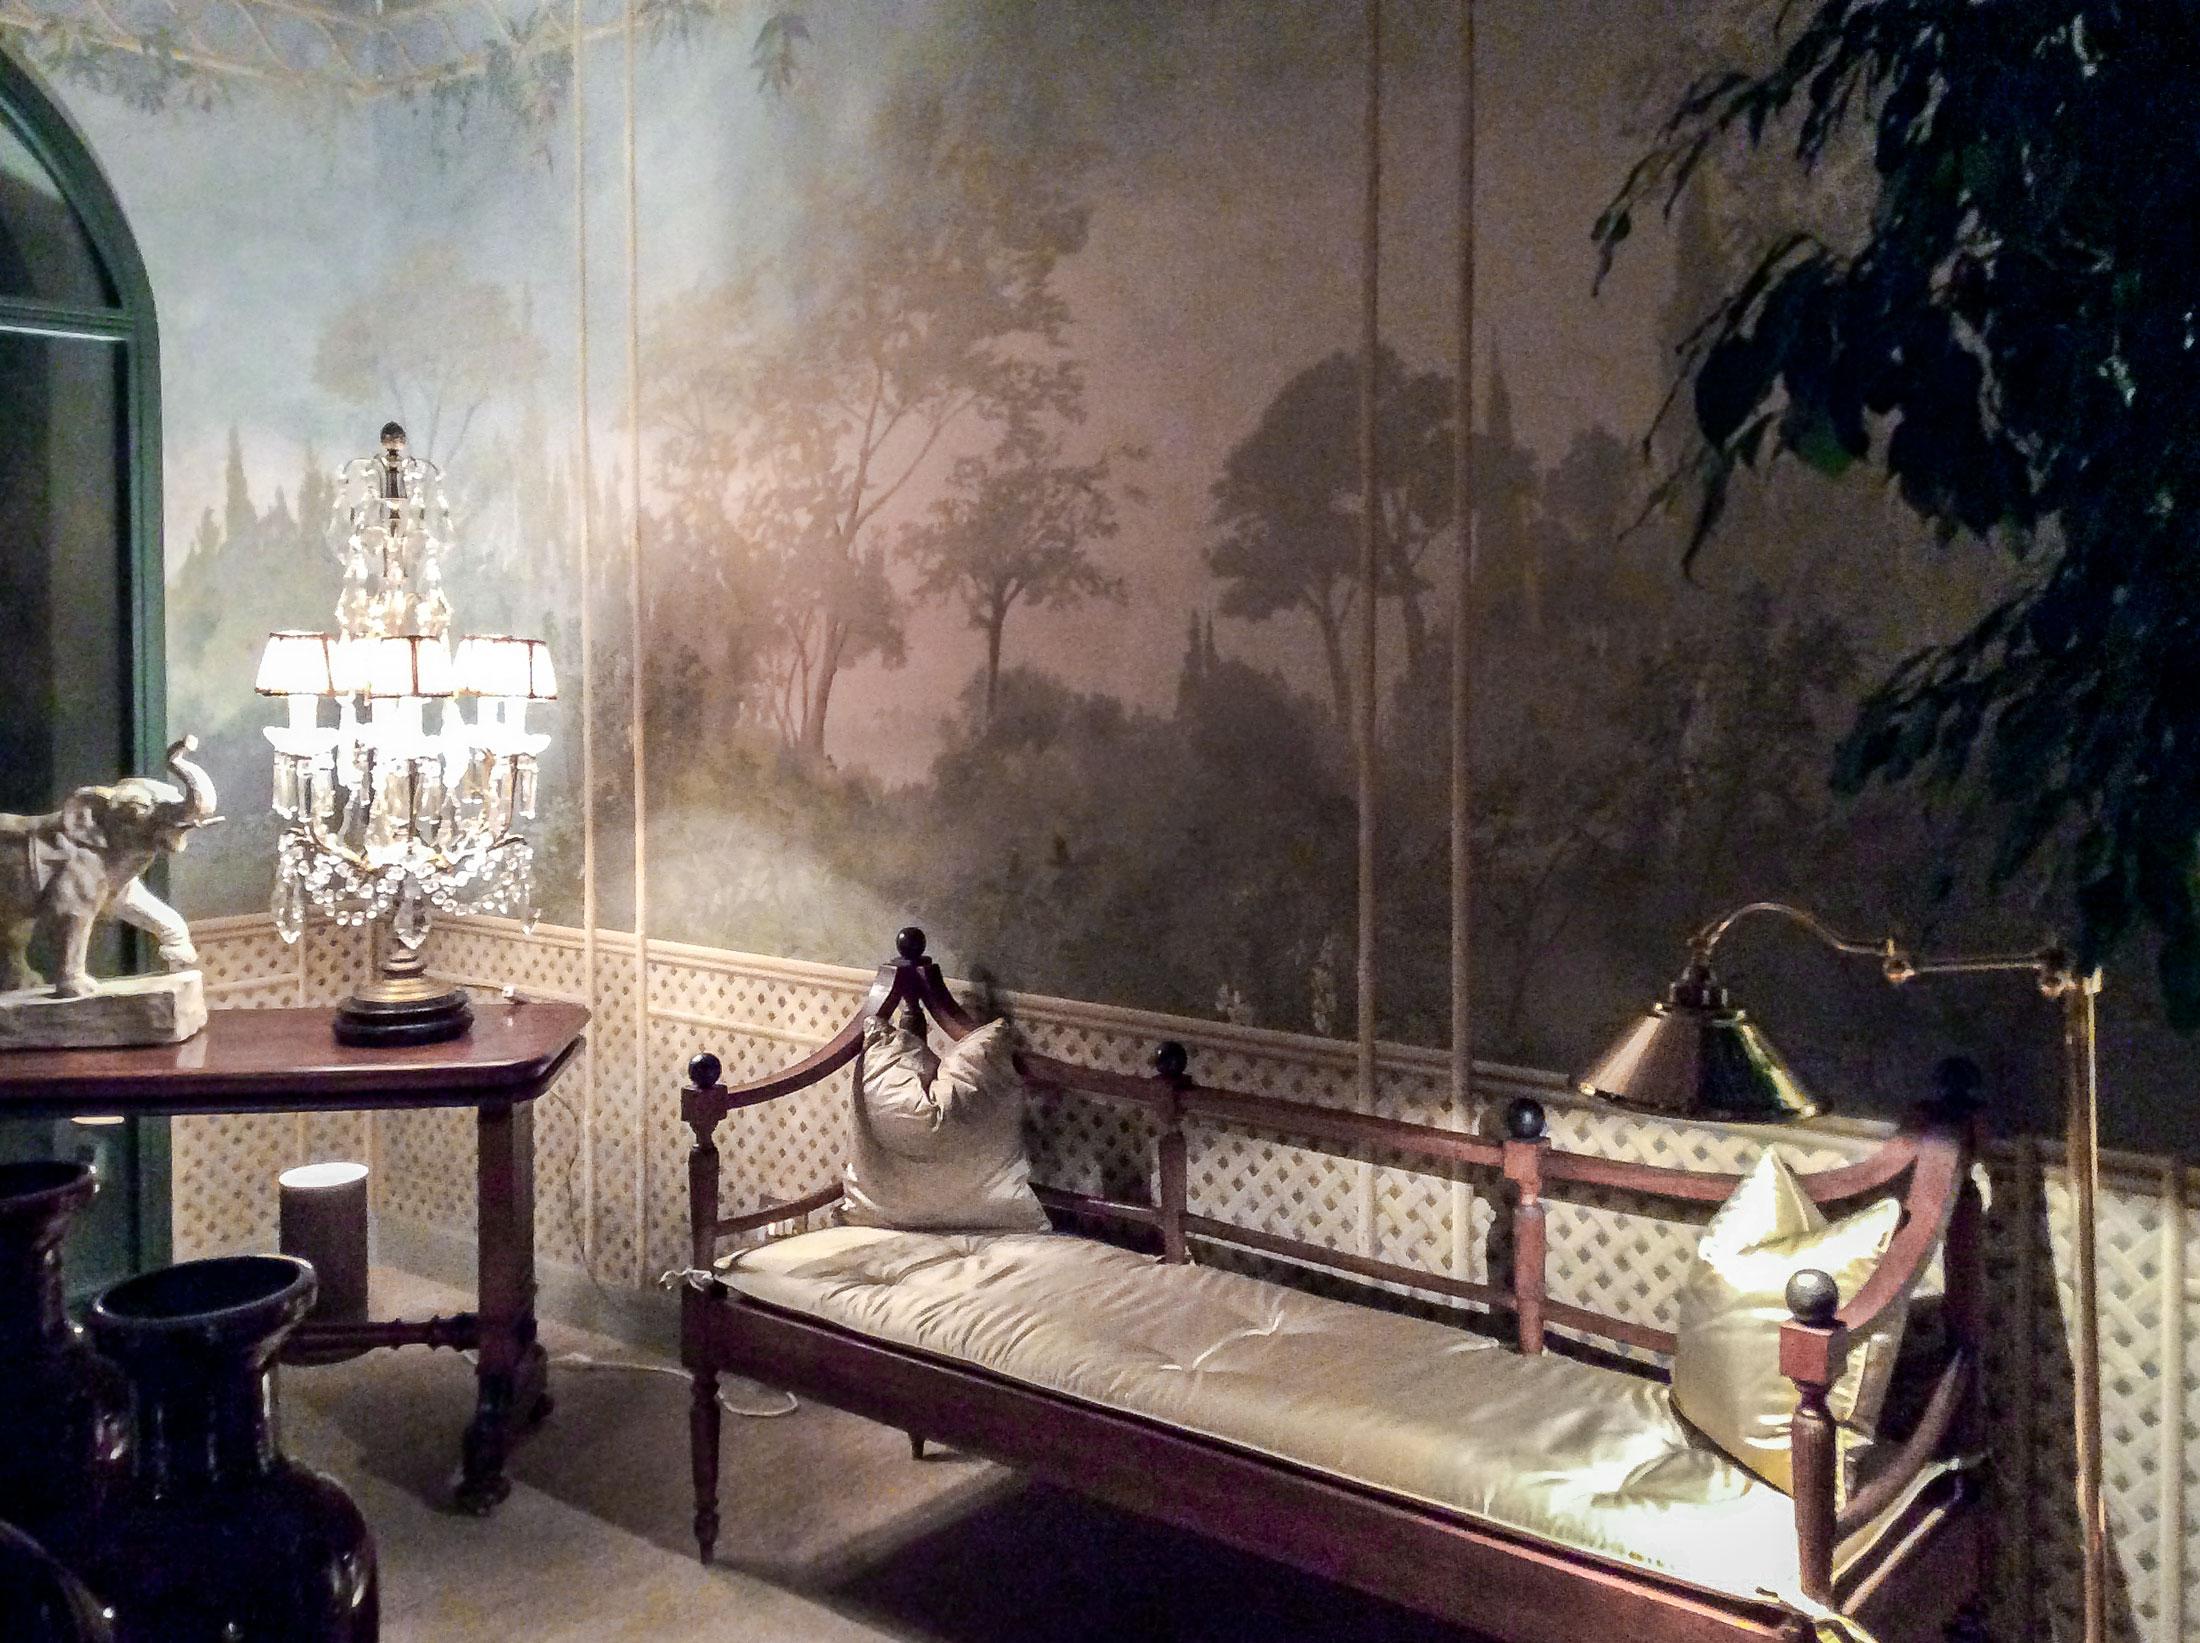 Bamboo pergola at night - Alexander Hamilton - Decorative Artist - London